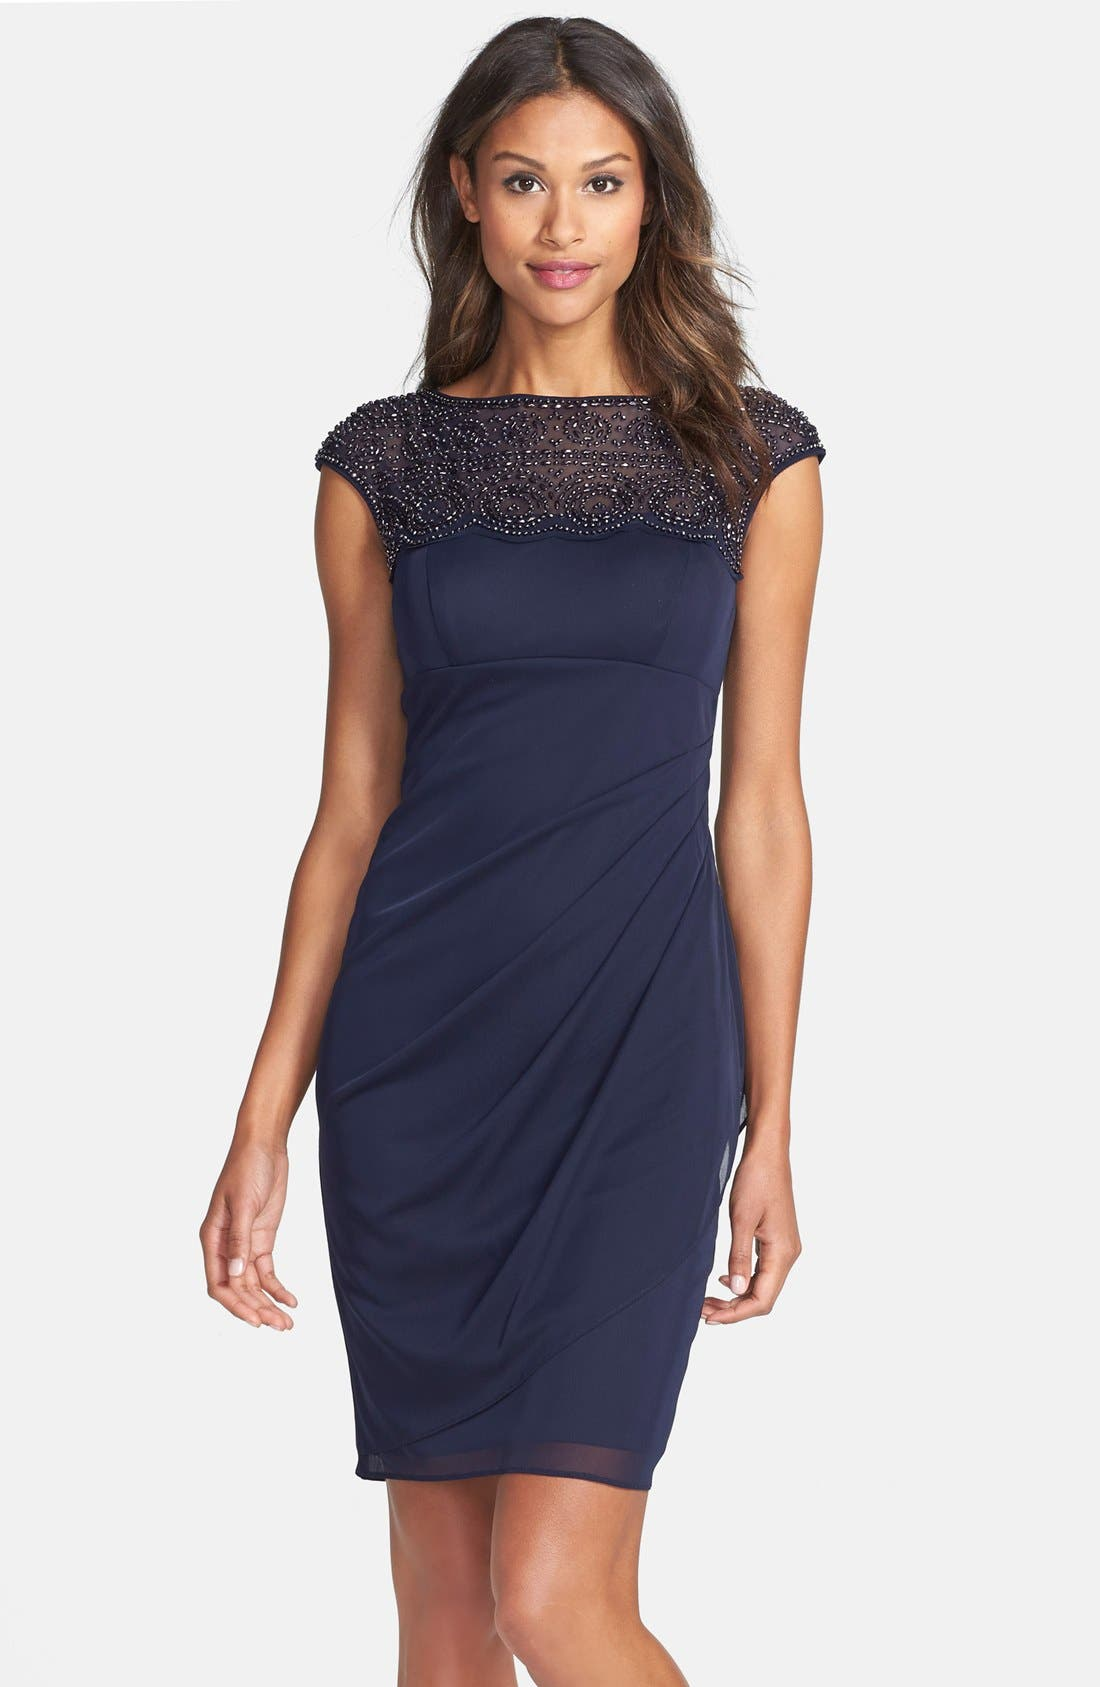 Alternate Image 1 Selected - Xscape Beaded Jersey Sheath Dress